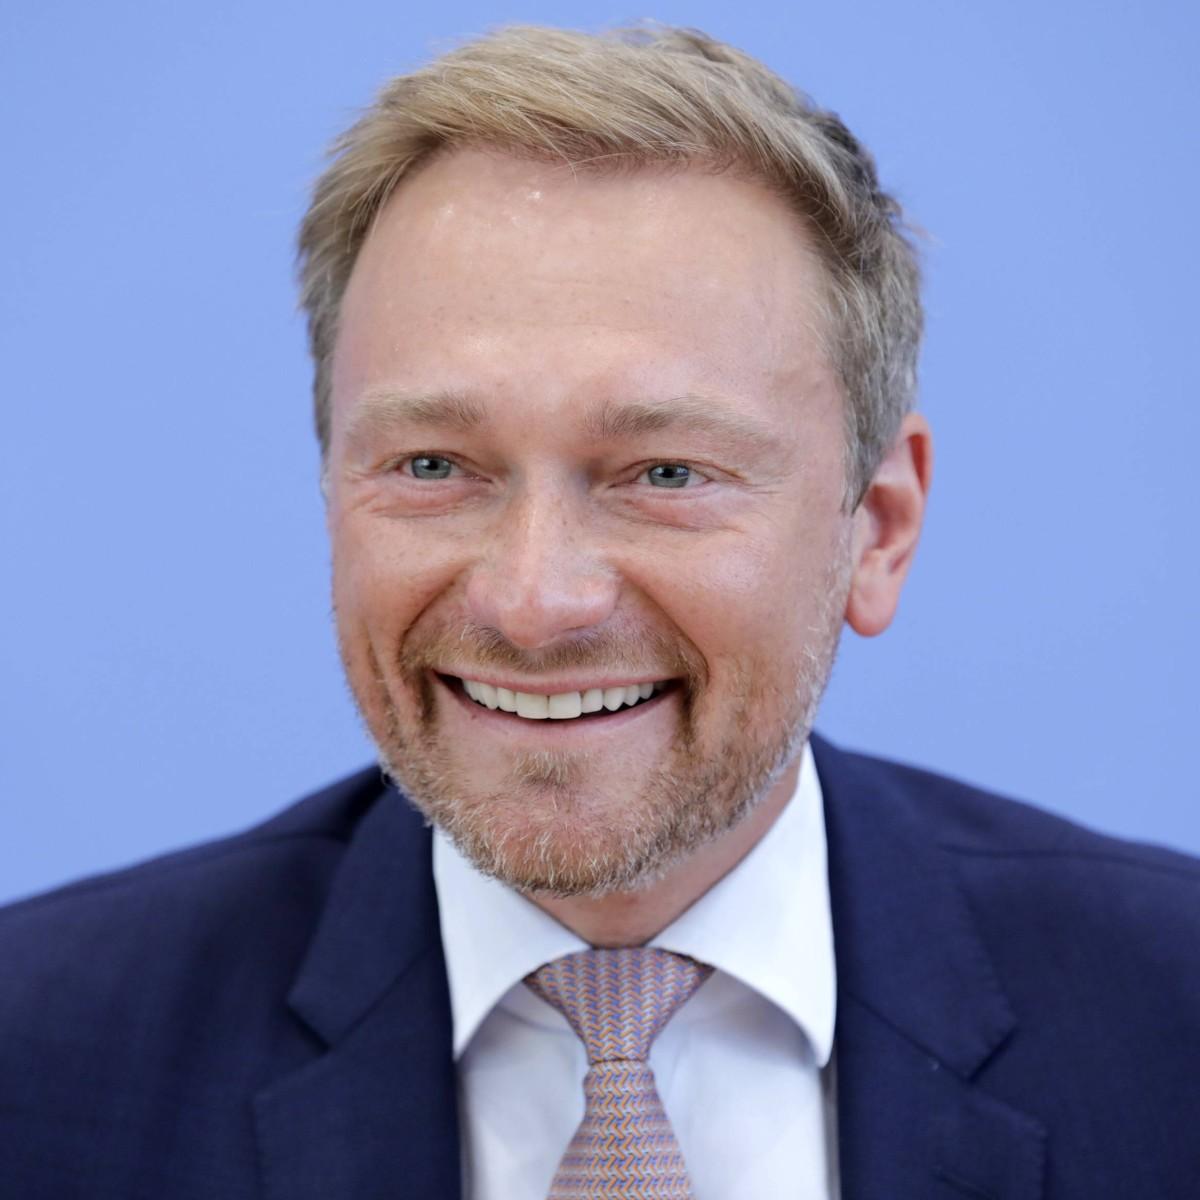 Christian Lindner Und Rtl Reporterin Franca Lehfeldt Sind Ein Paar Bildderfrau De